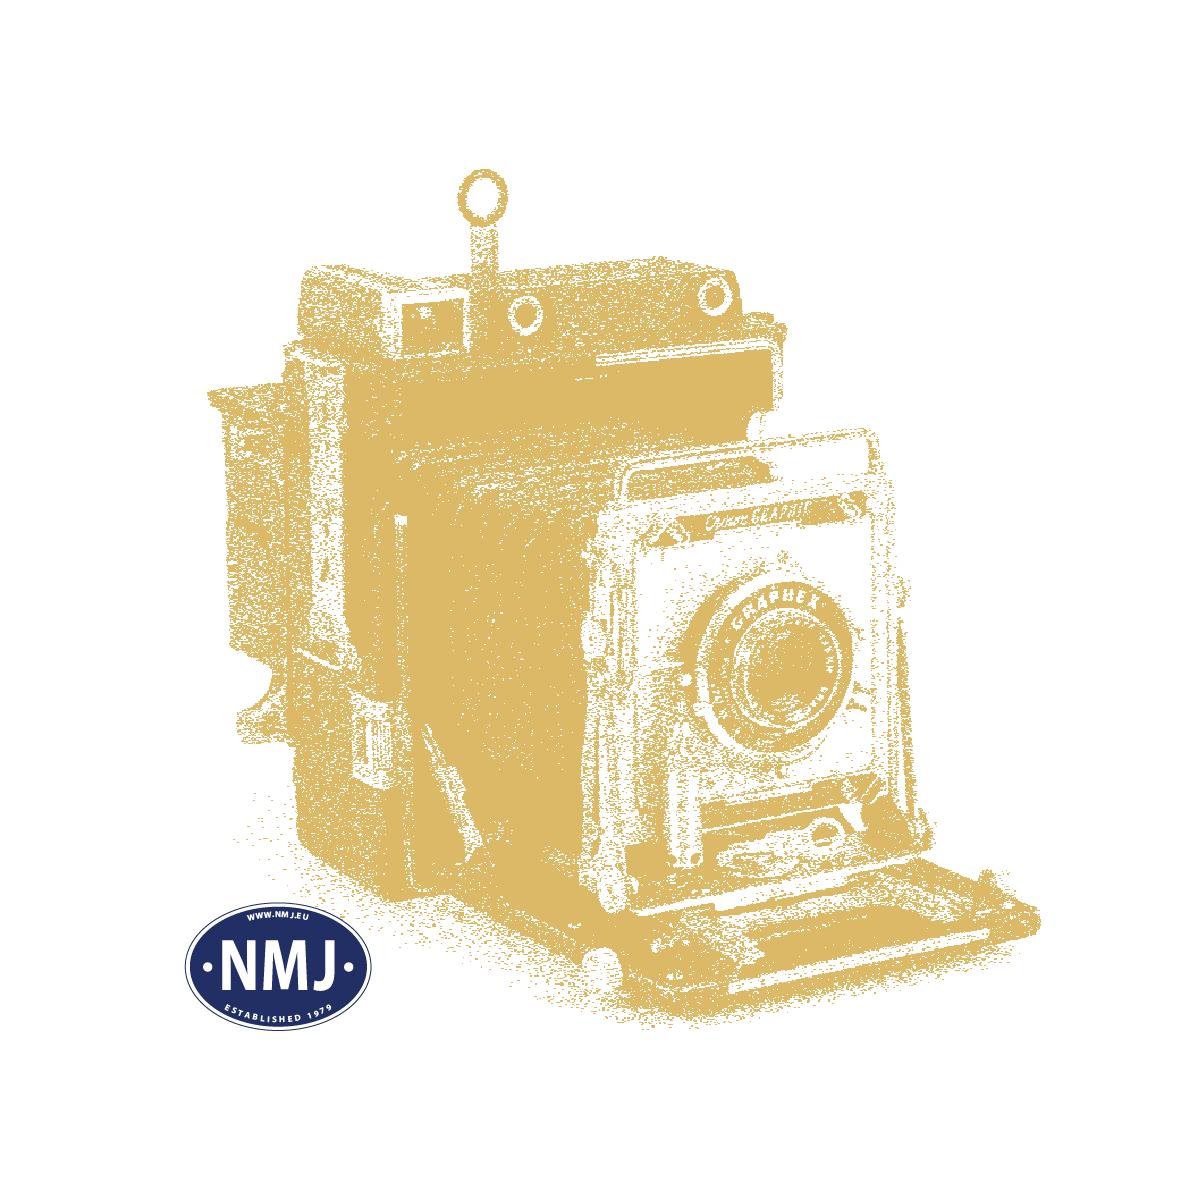 NOC36083 - Trafikkpoliti, 6 Stk, N-Skala